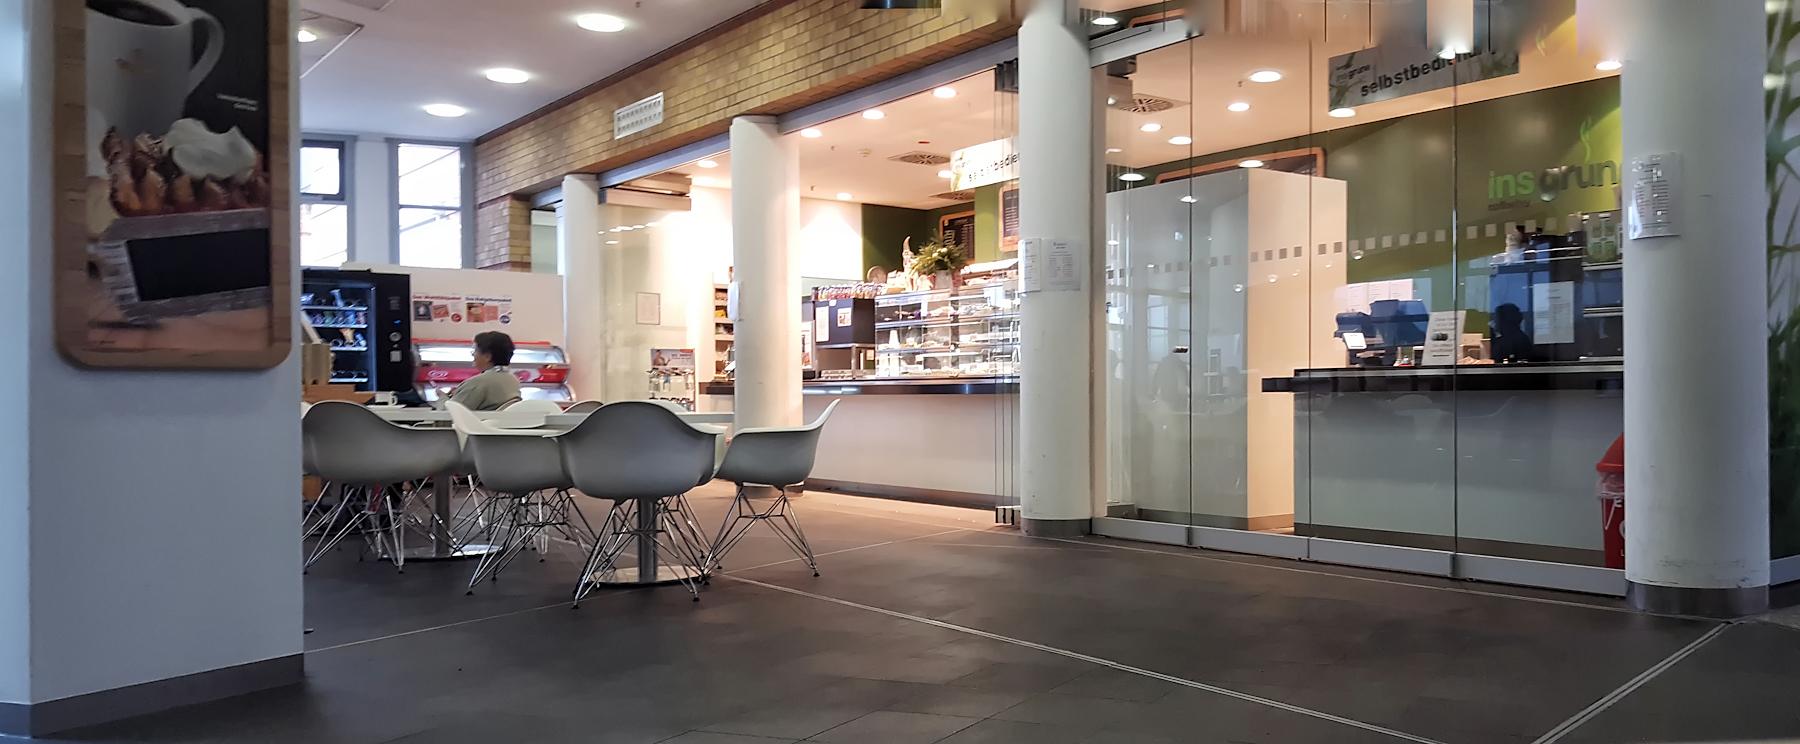 Cafeteria im Klinikum Greifswald